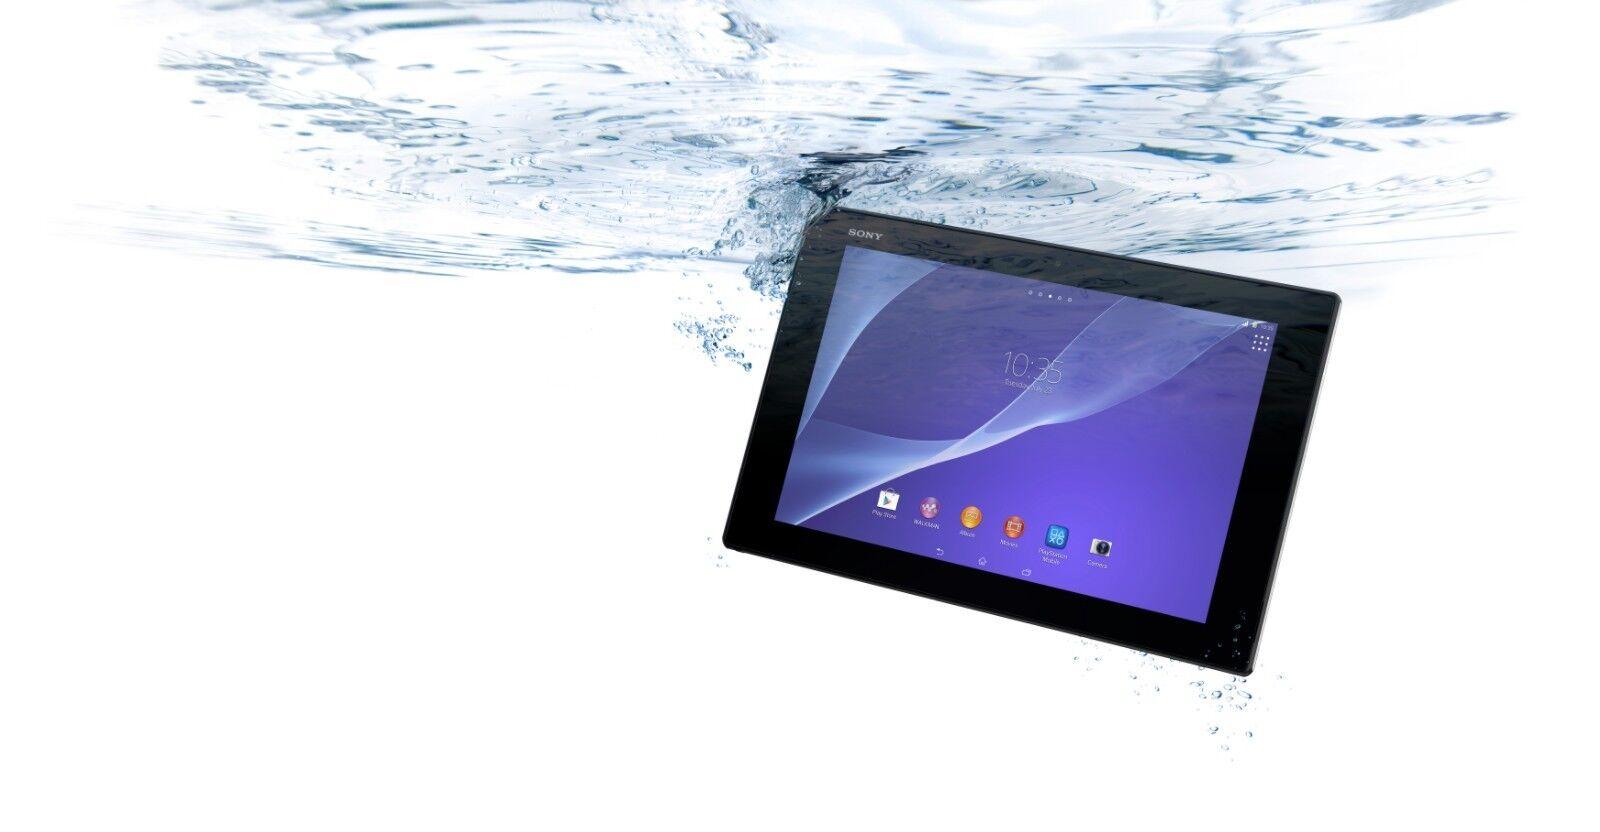 WATERPROOF Sony Xperia Z2 4G LTE Tablet Black 101 Inch